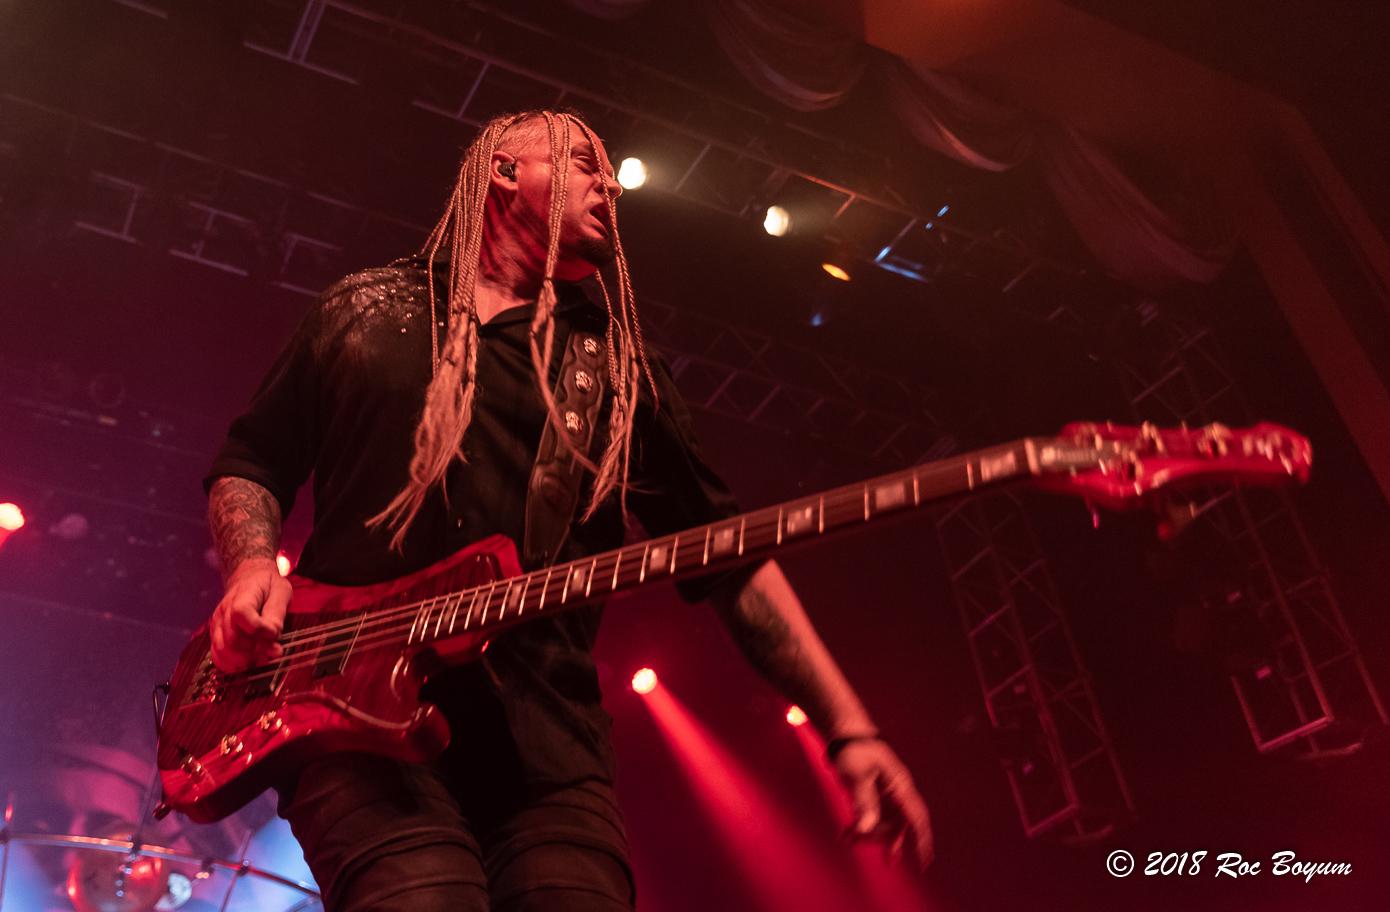 Kamelot Sean Tibbetts Concert Reviews Concert Photography